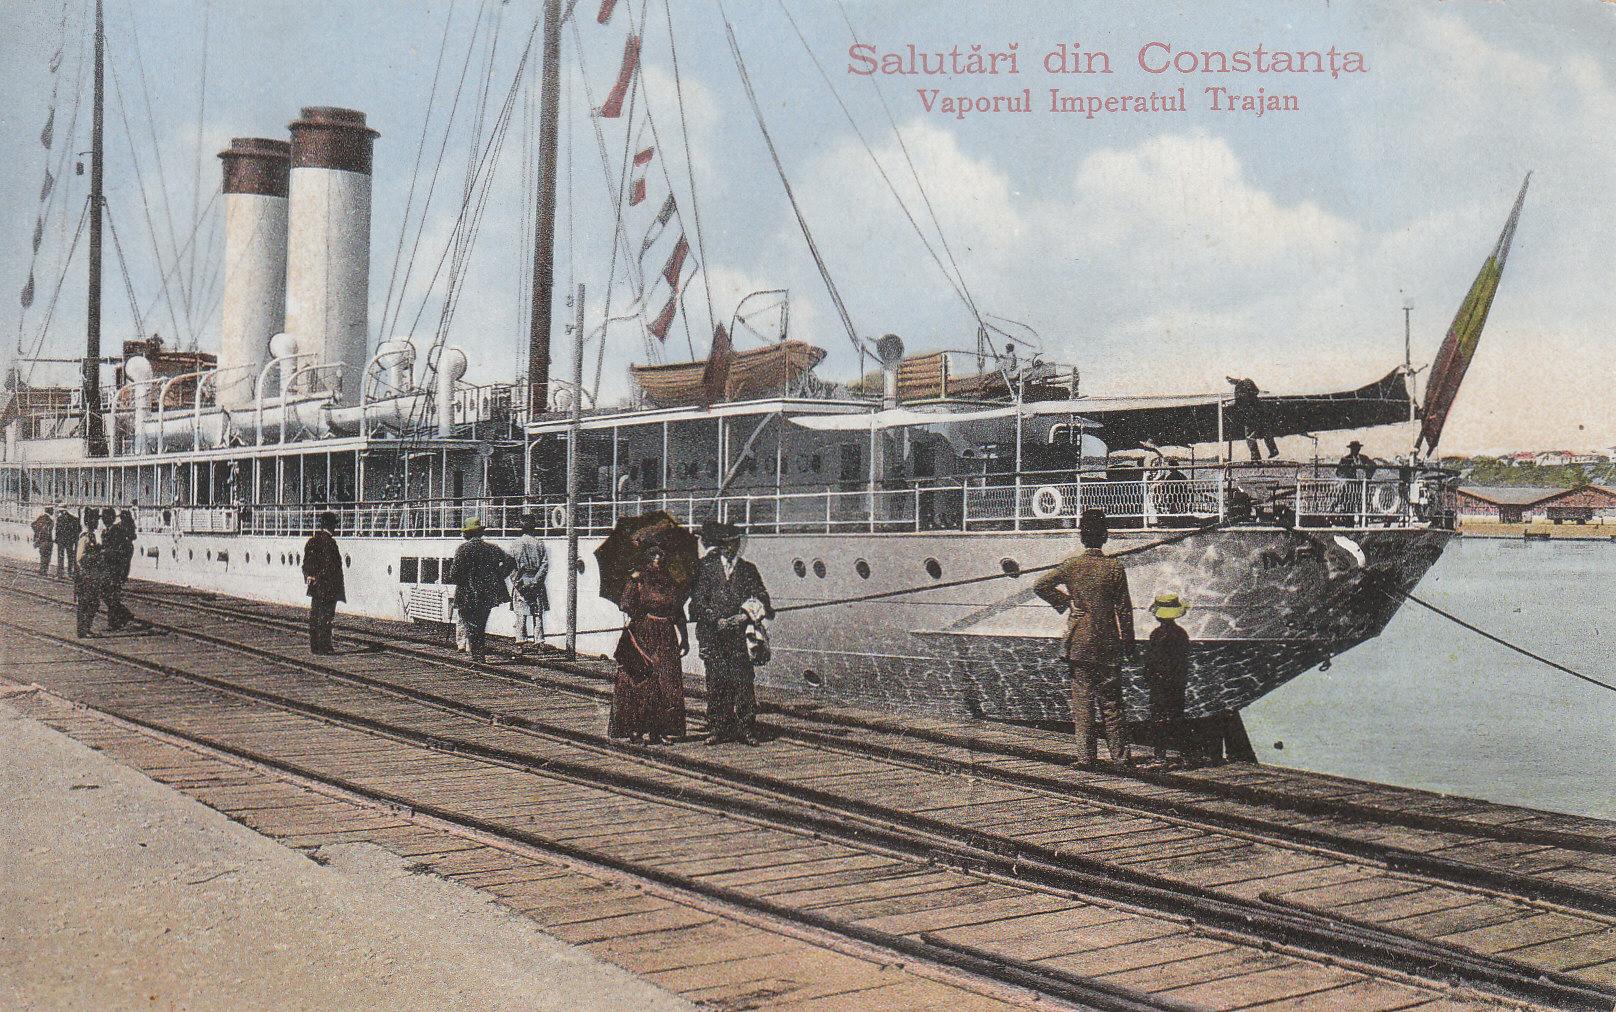 Nava IMPARATUL TRAIAN in portul Constanta (colectia Vasile Mihalache)